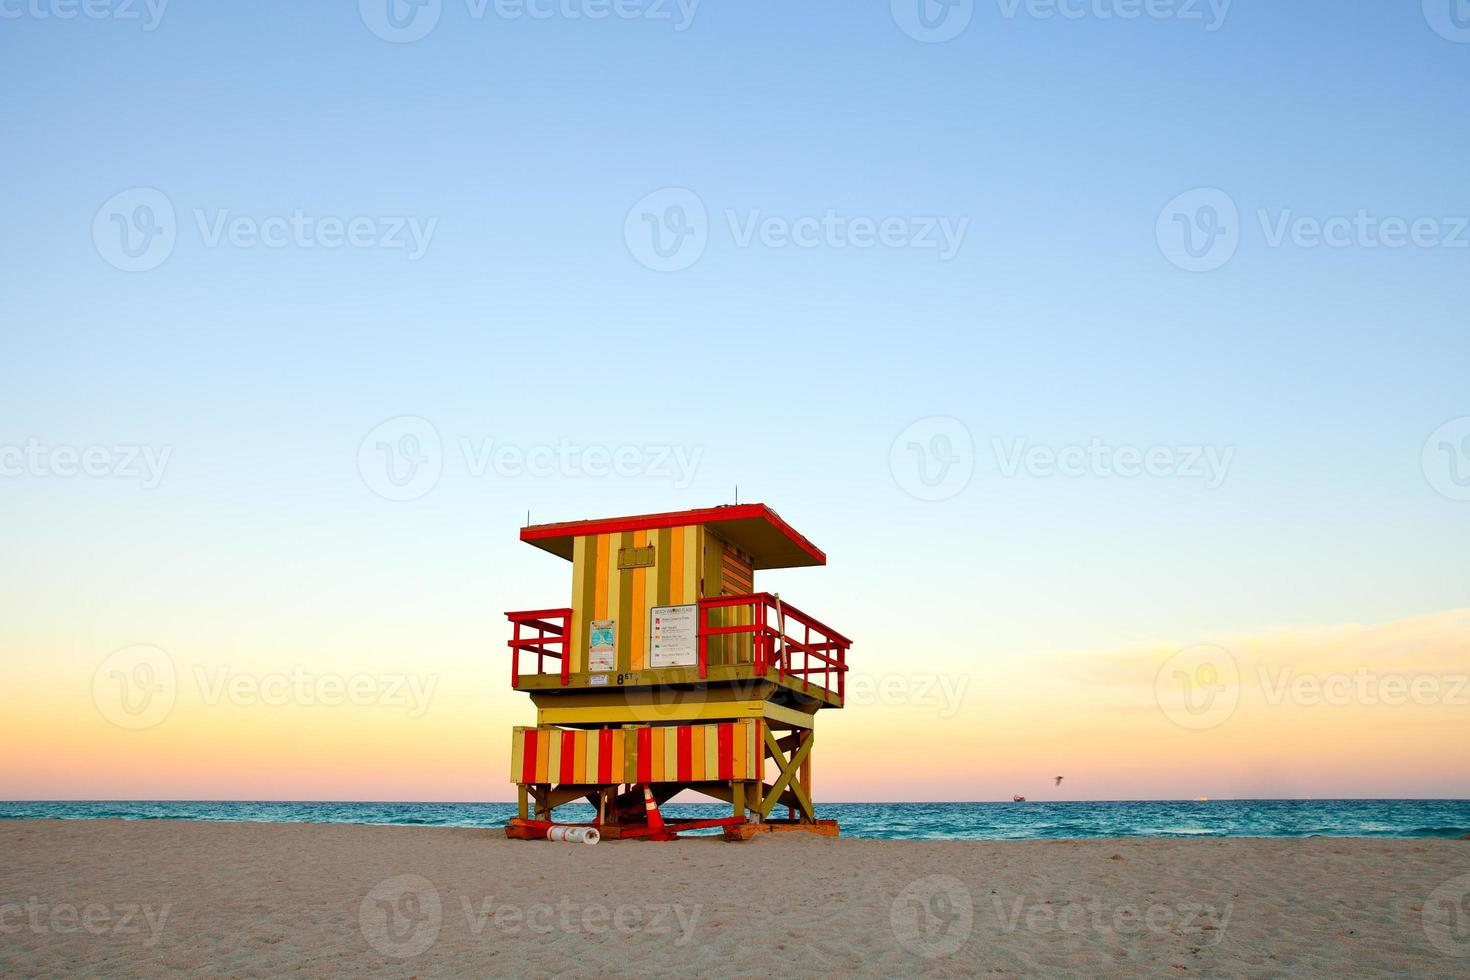 casa de salva-vidas de miami beach foto